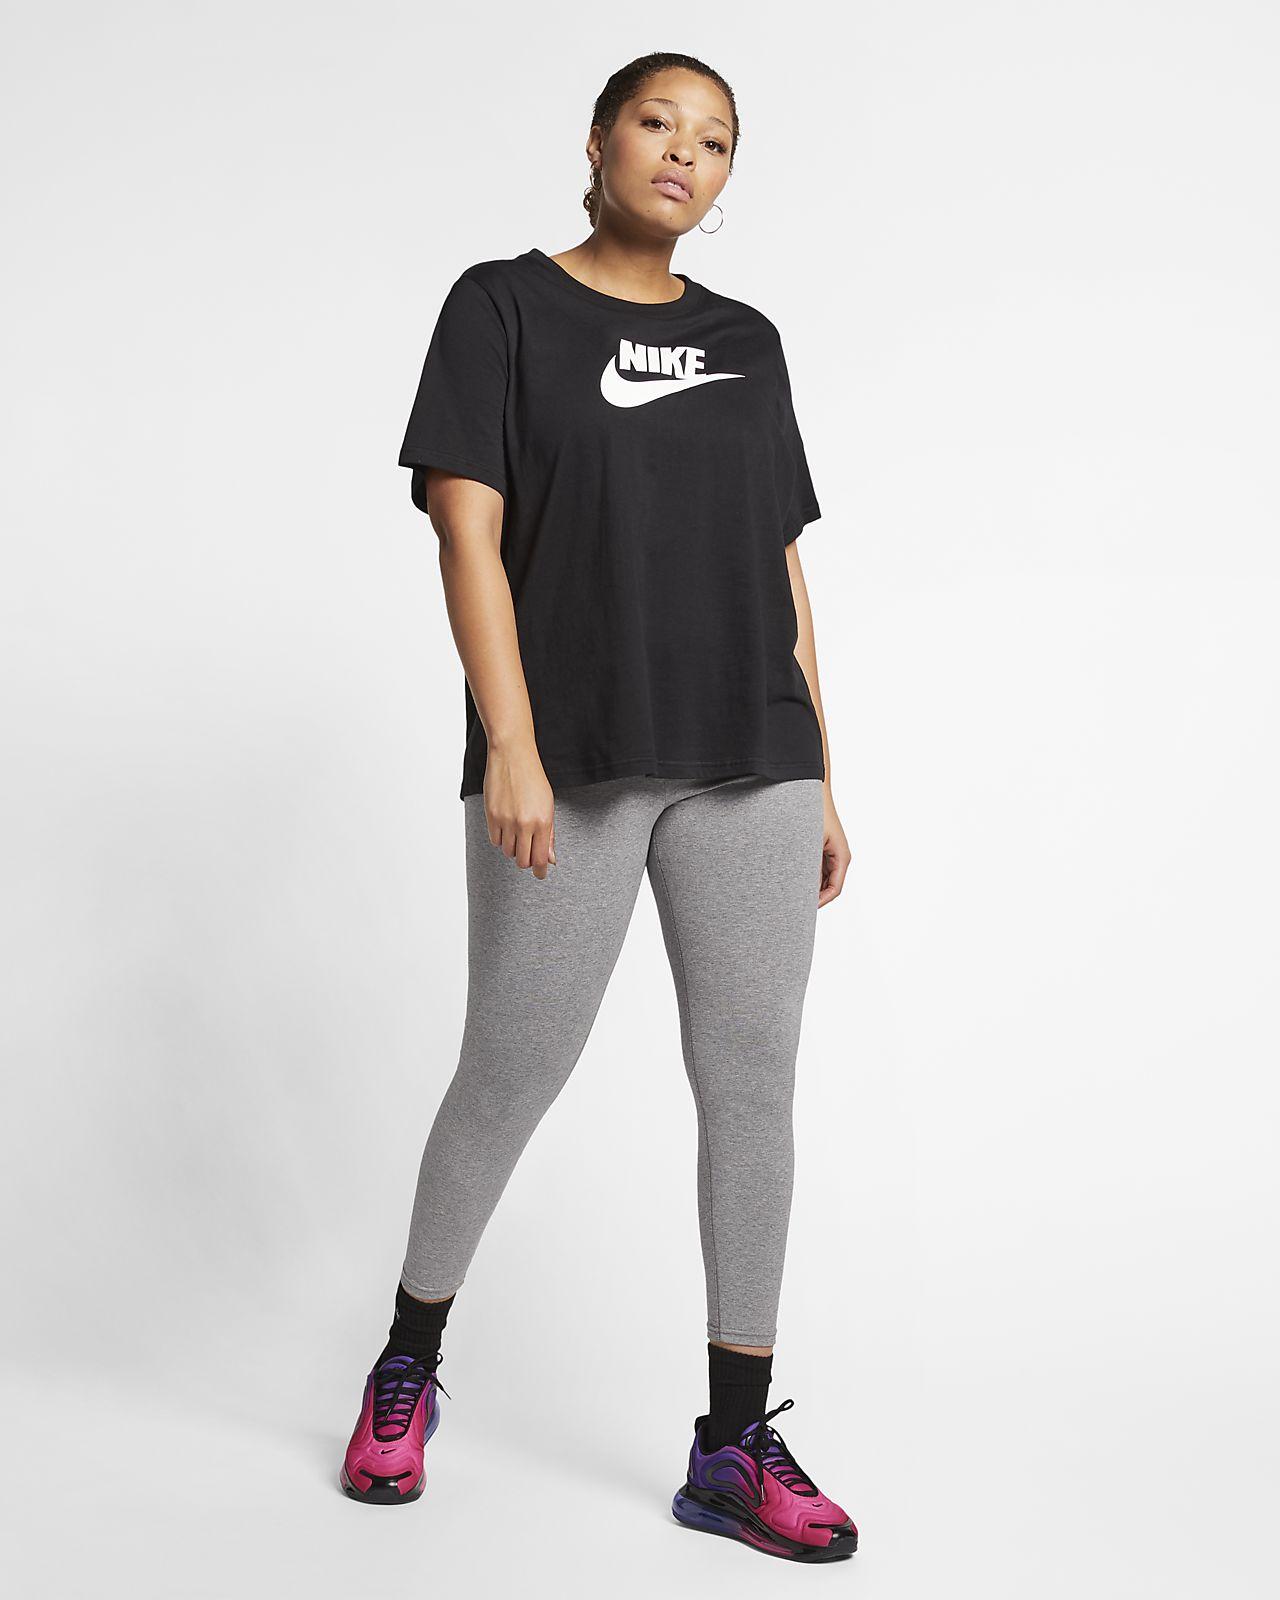 56bb1ffb3f1 Nike Sportswear Essential Women s T-Shirt (Plus Size). Nike.com CA